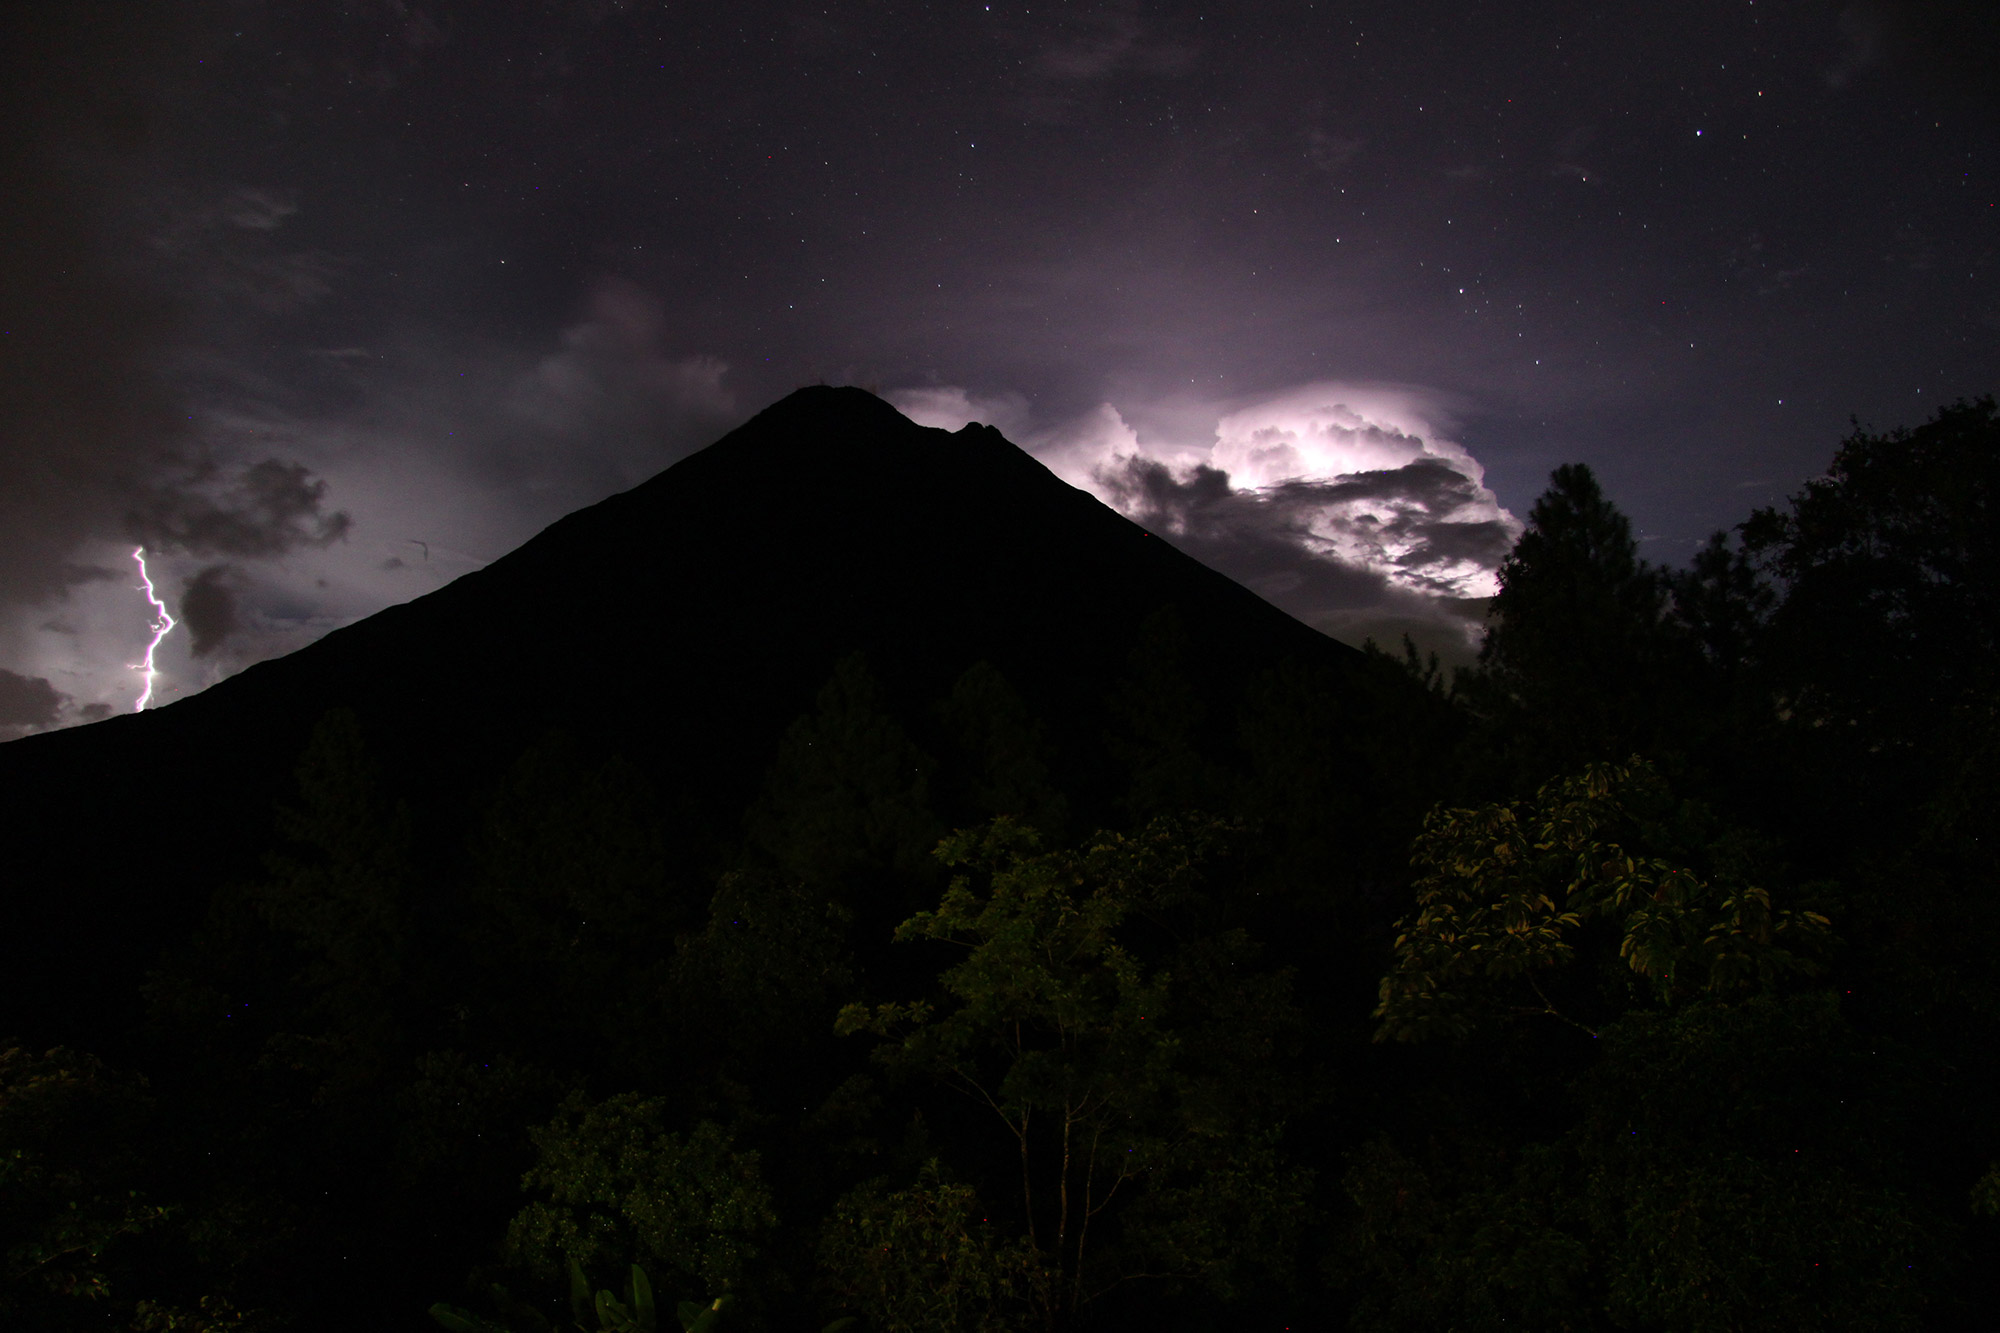 Onze favoriete nationale parken van Costa Rica - Parque Nacional Volcán Arenal